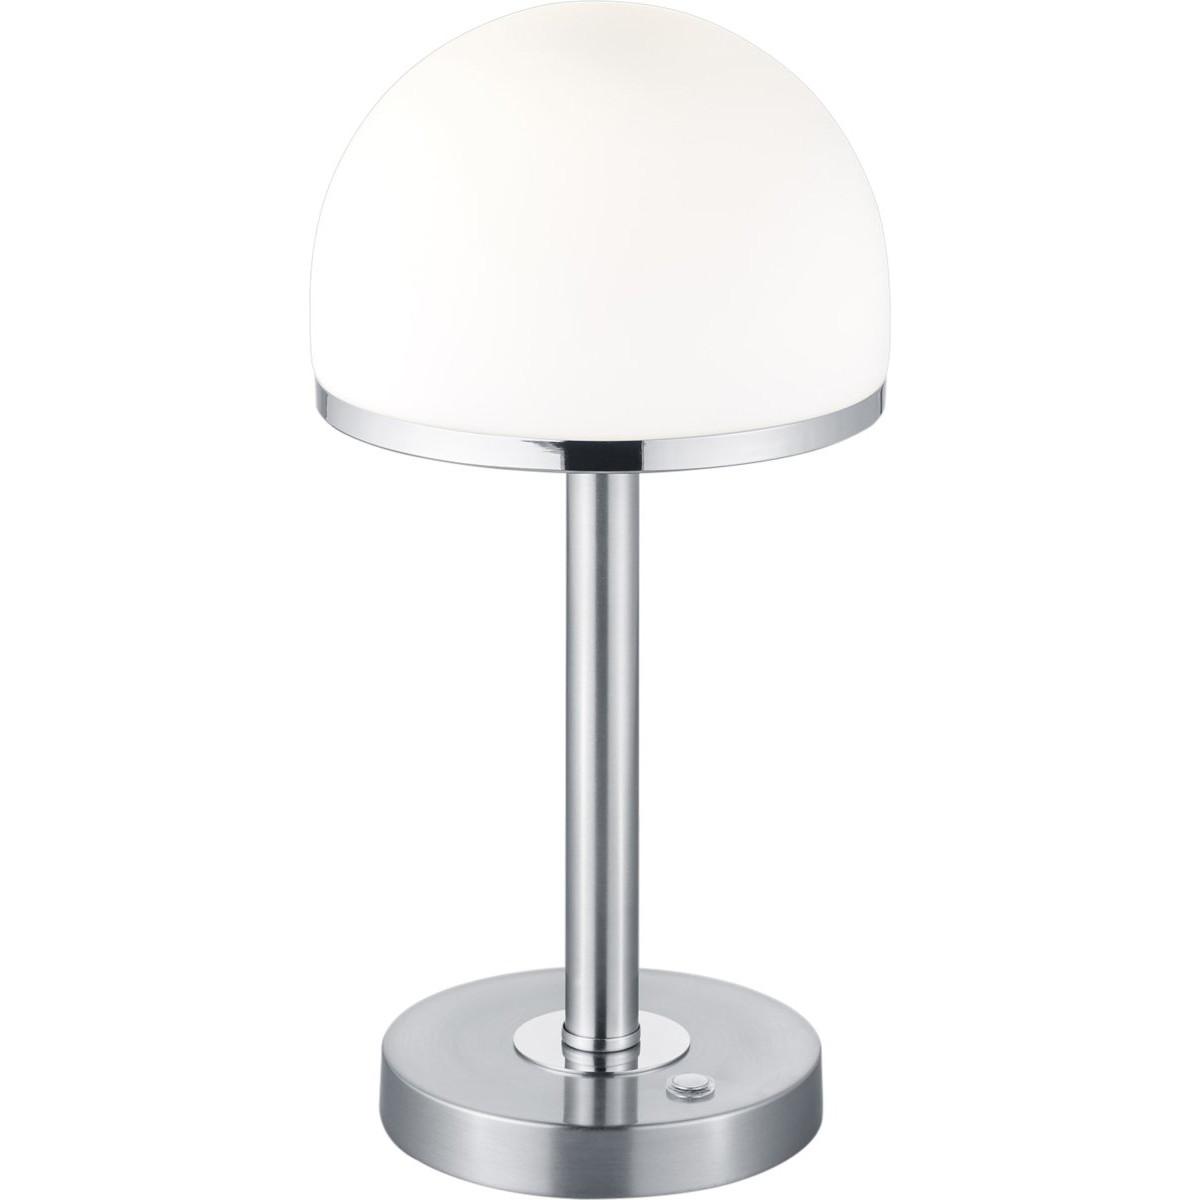 LED Tafellamp - Trion Berl - 4W - Warm Wit 3000K - Dimbaar - Rond - Mat Nikkel -